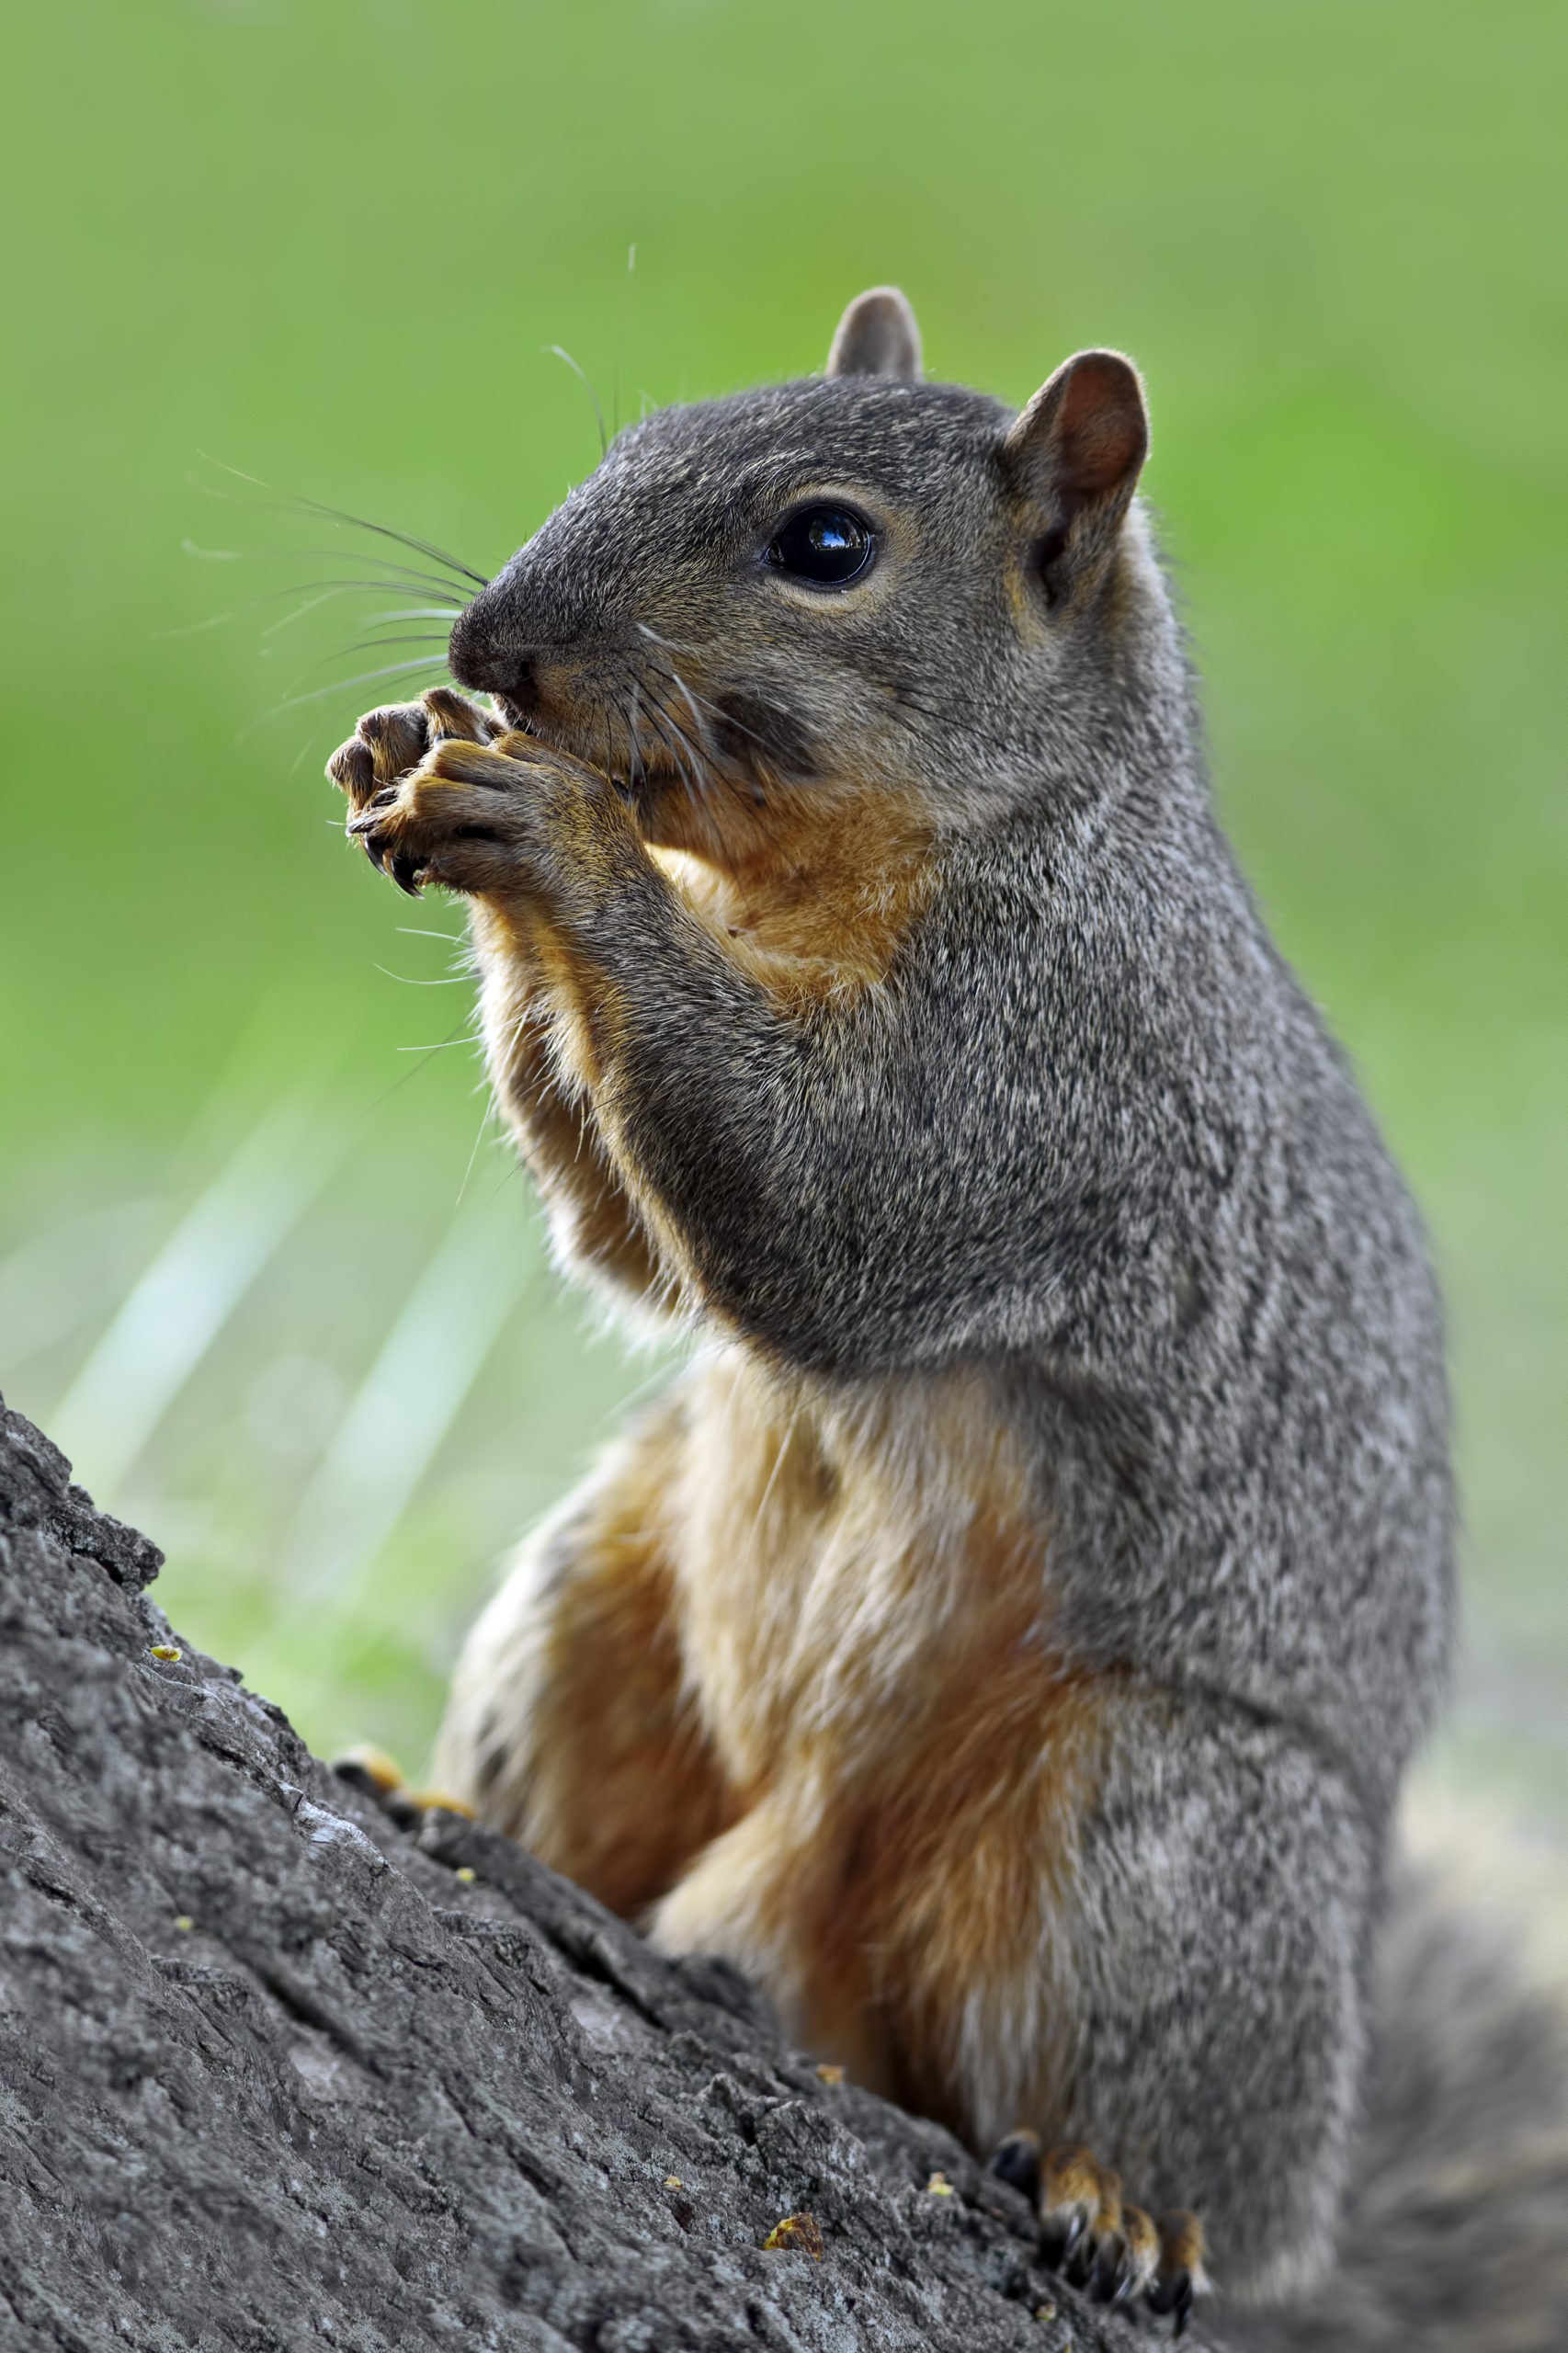 Picture of a feeding eastern fox squirrel